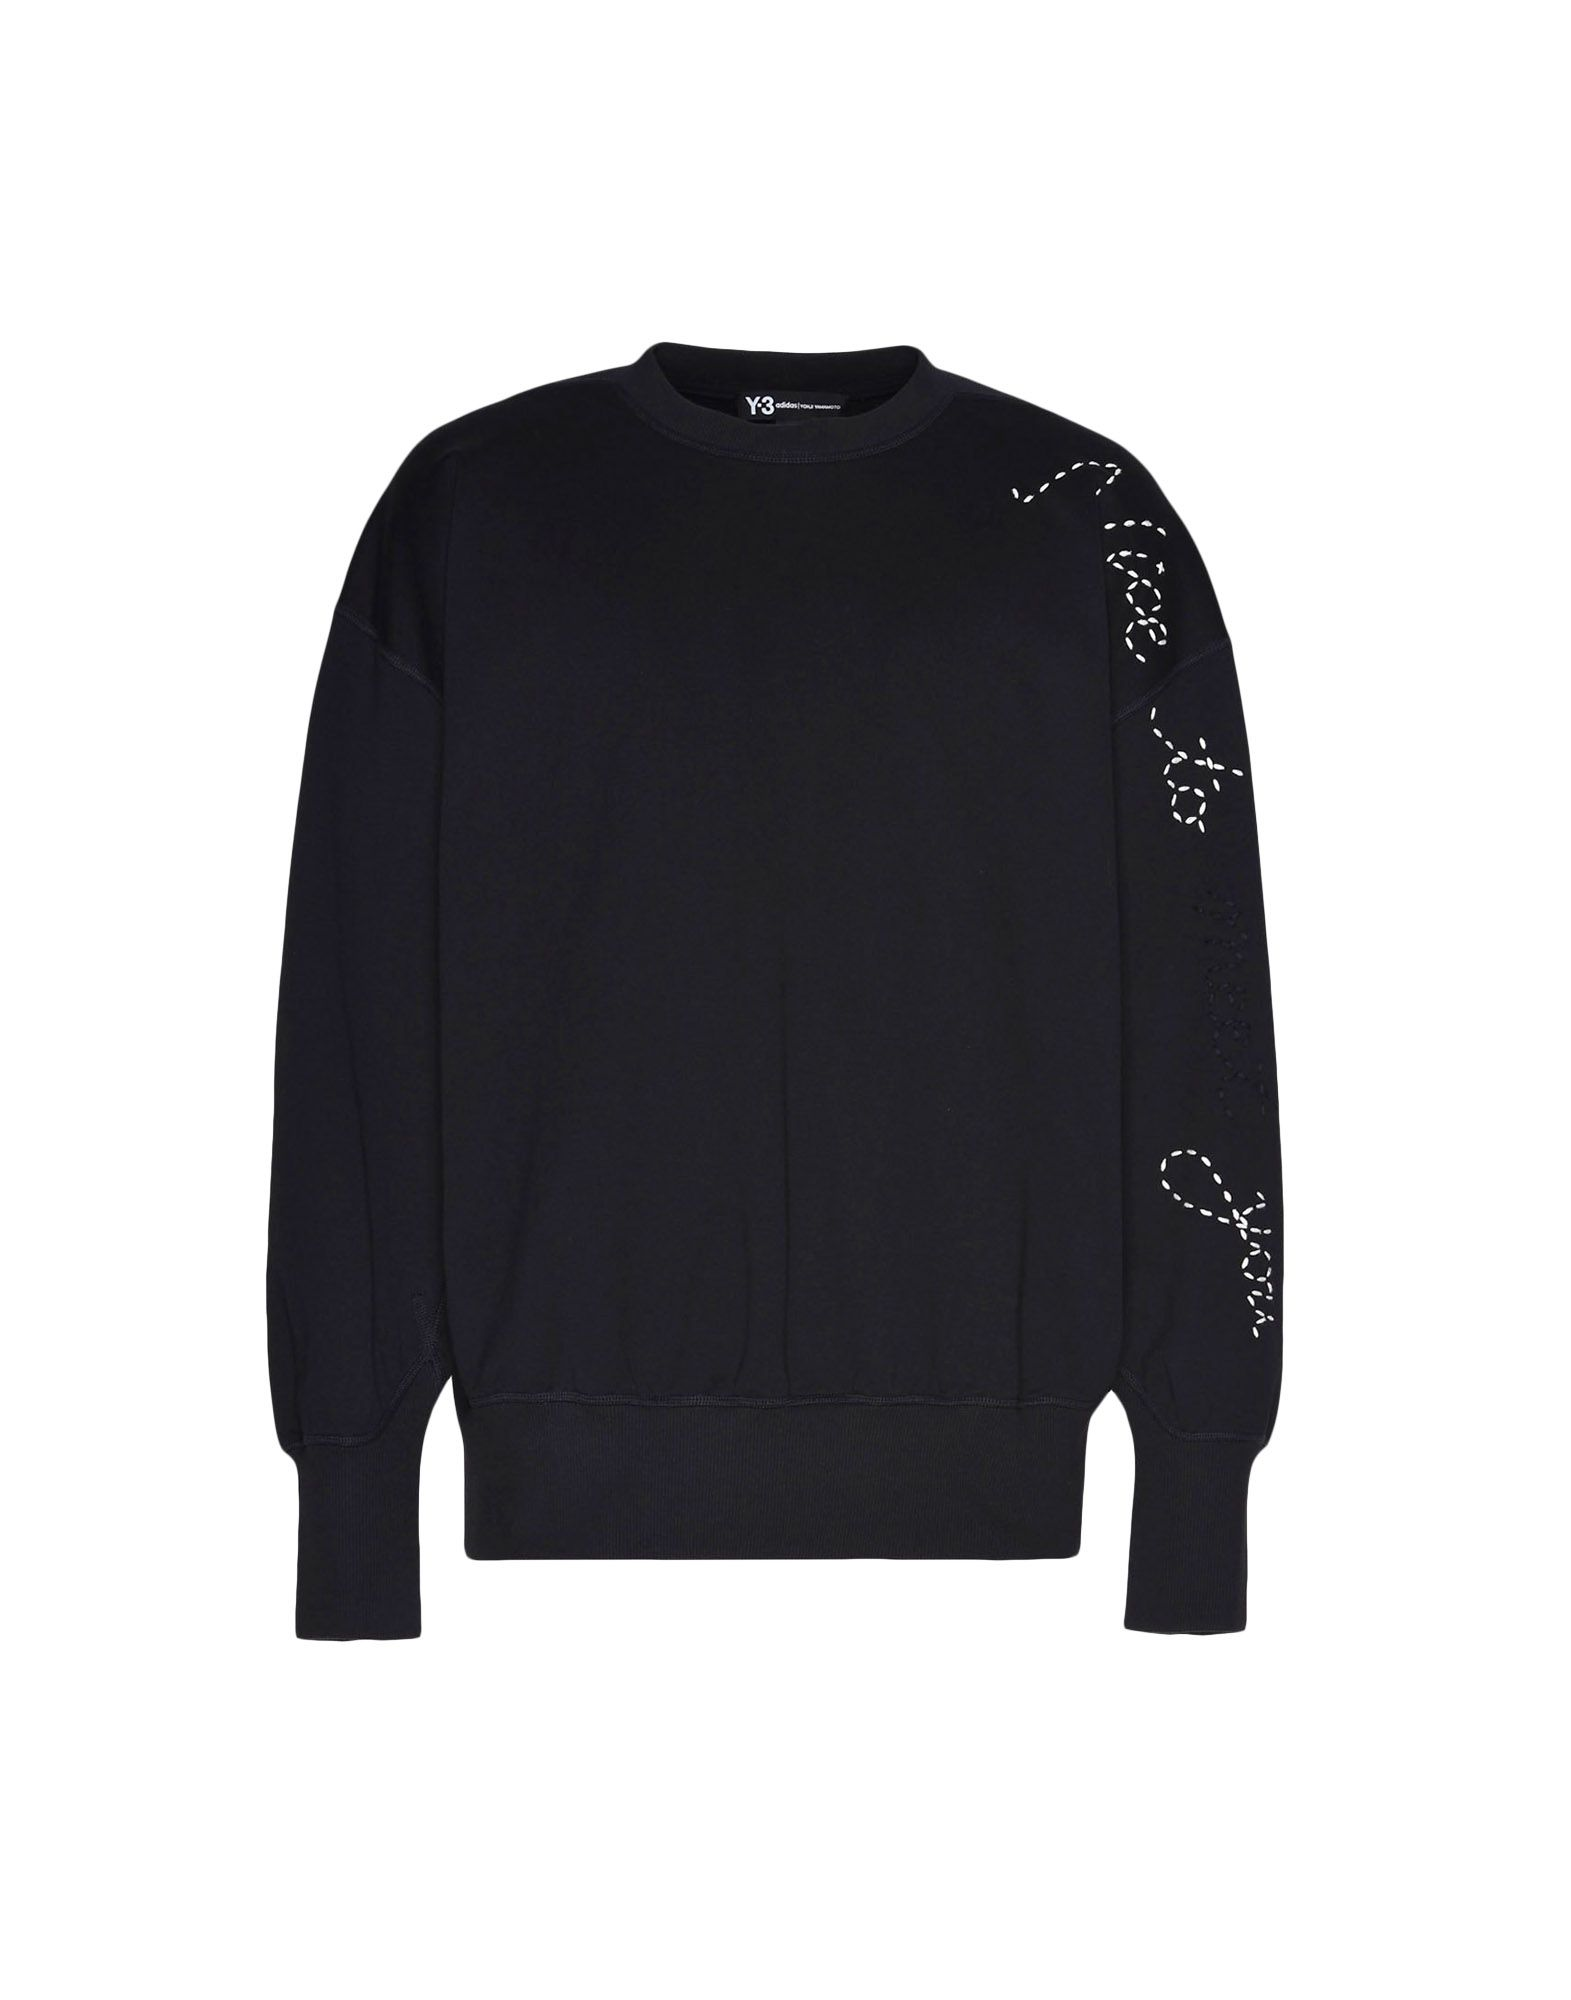 Y-3 Y-3 Sashiko Slogan Sweater Sweatshirt Man f